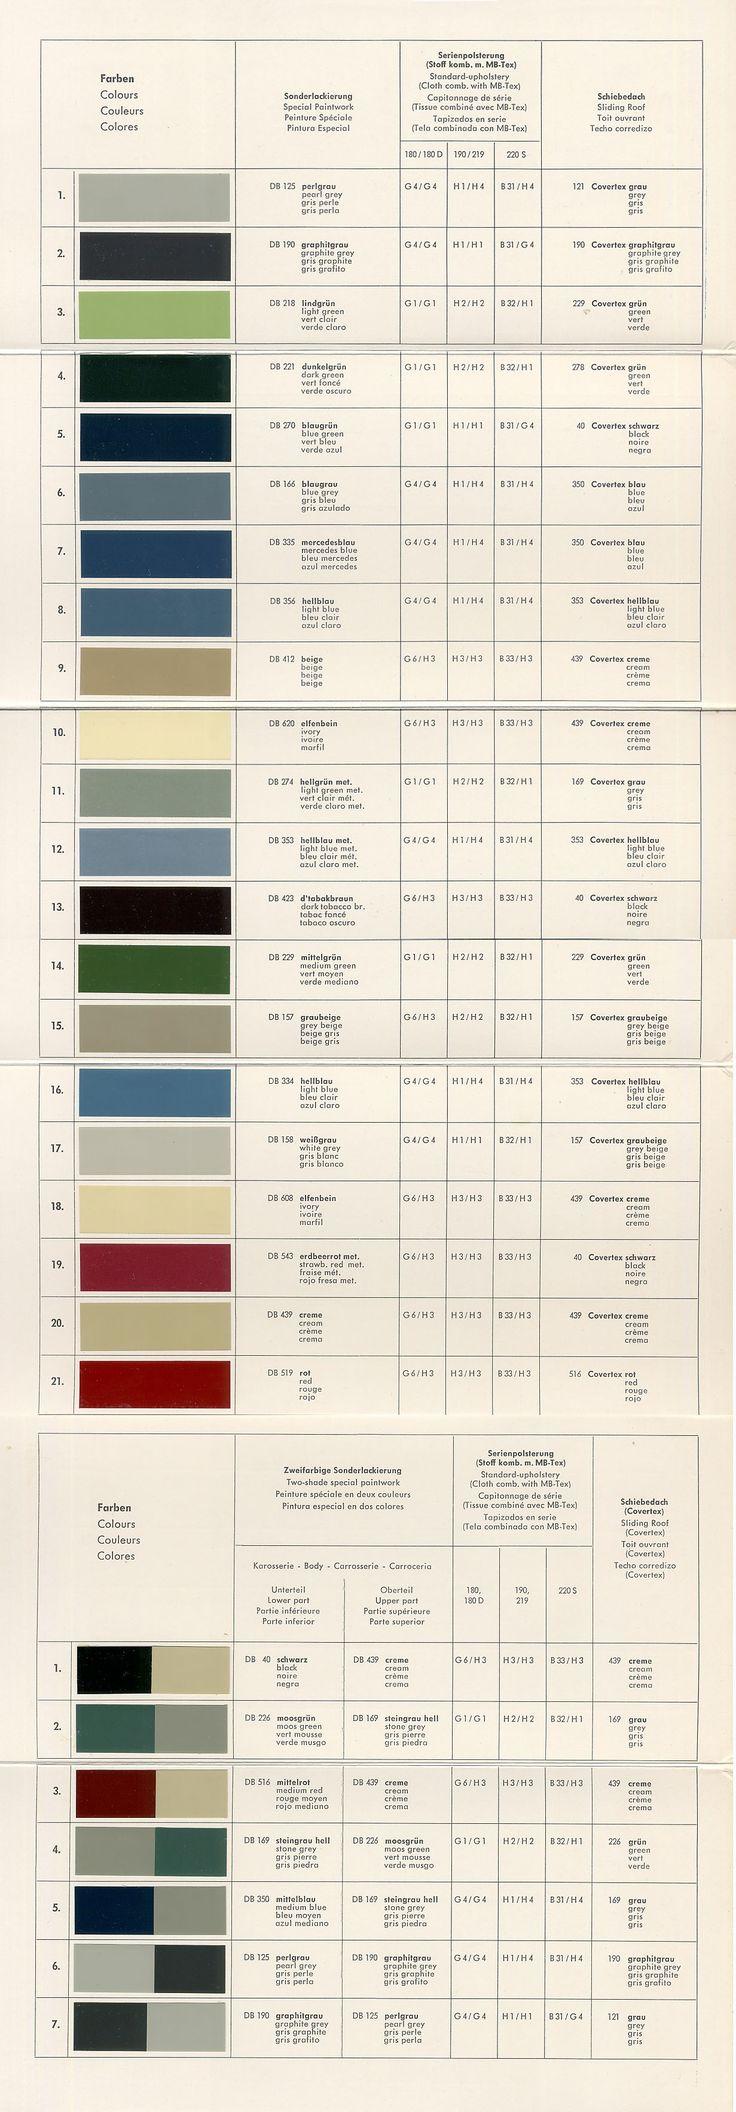 17 best images about mercedes w128 180 on pinterest for Mercedes benz paint colors